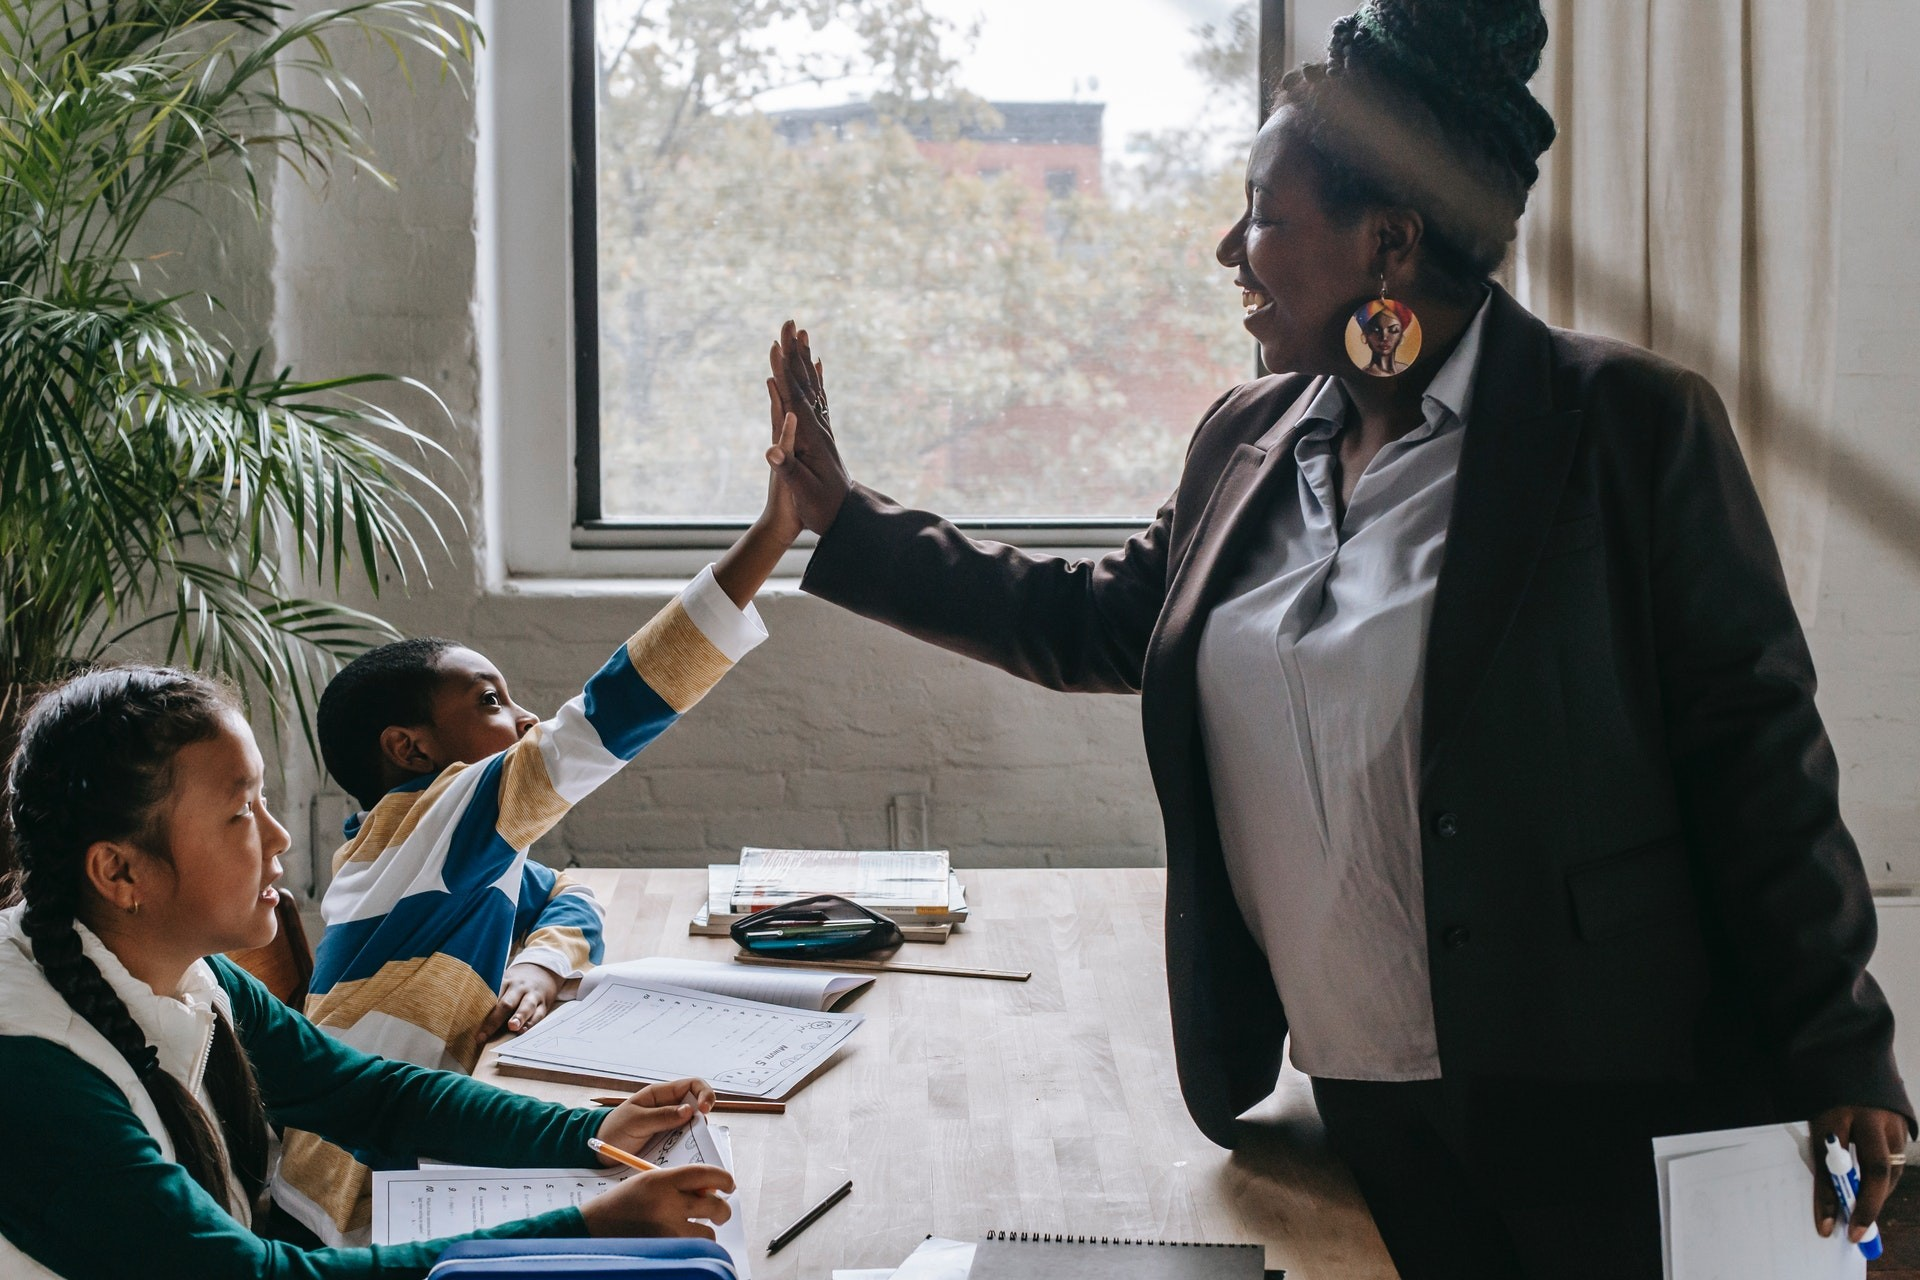 A teacher high-fives a student in her classroom as she teaches elementary math.